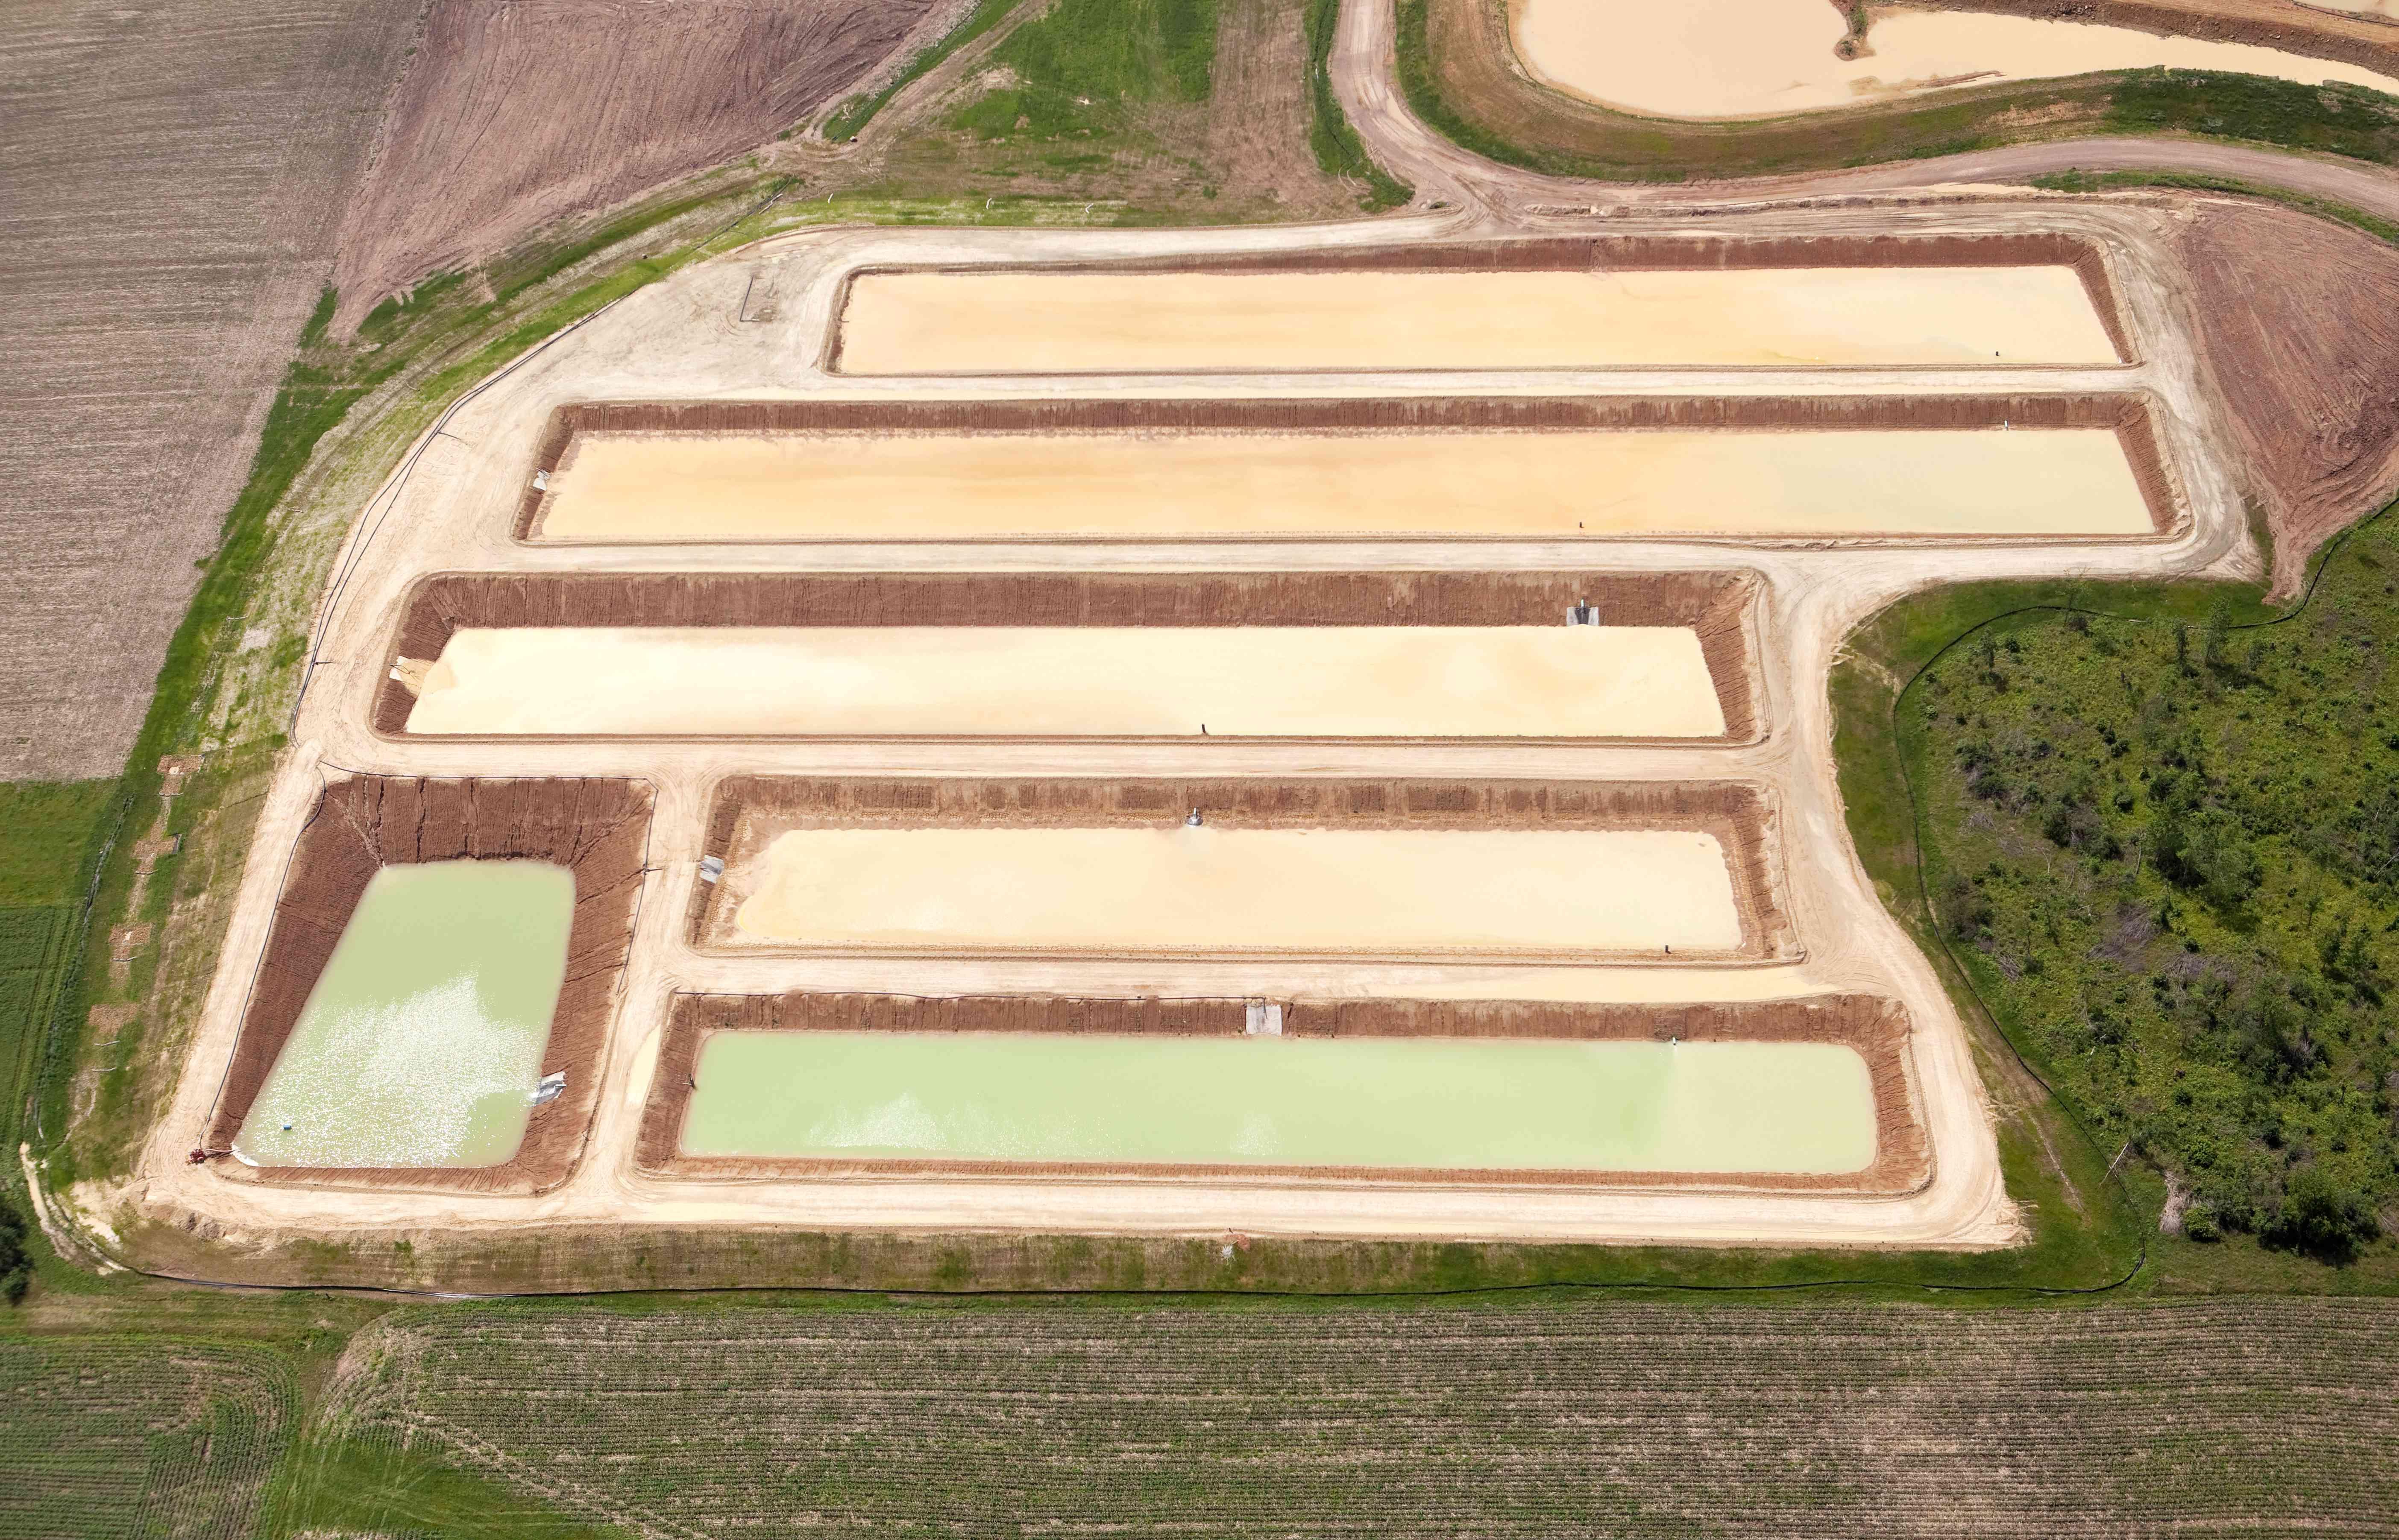 Frac Sand Washing Ponds at a Wisconsin Mine